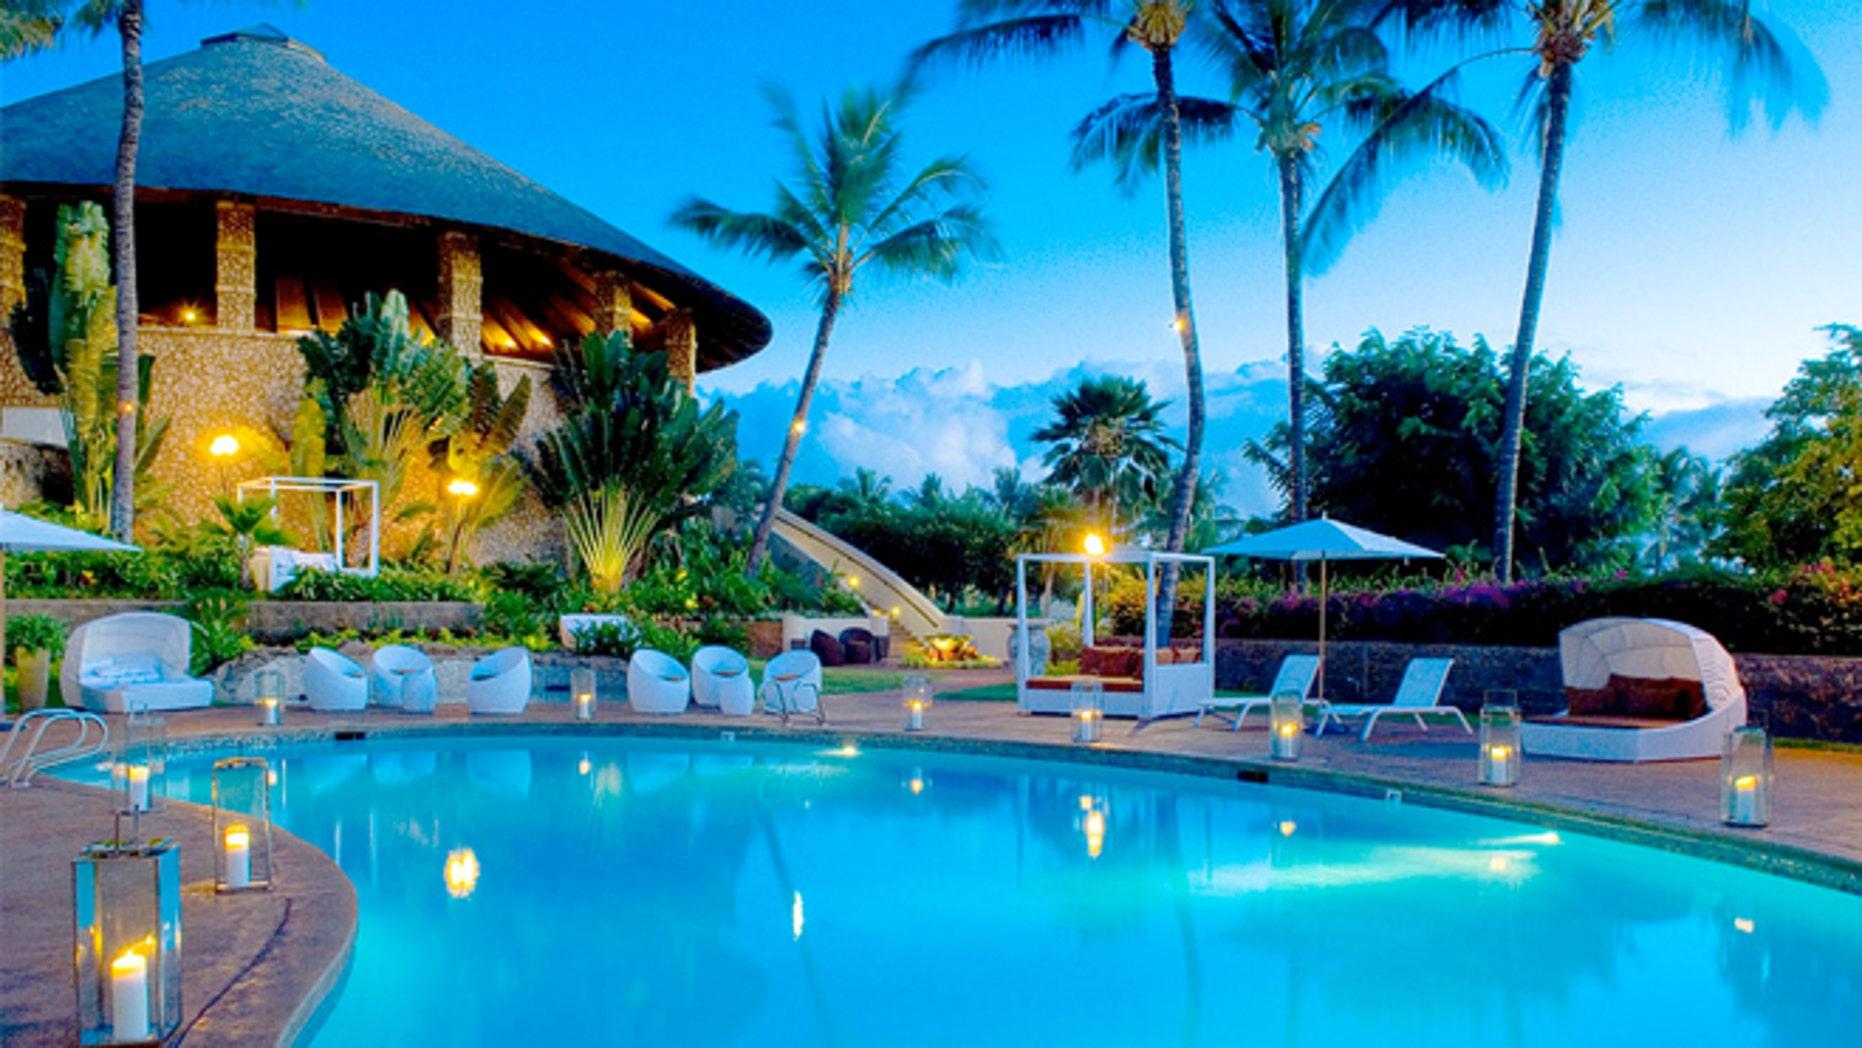 Aqua Resorts and Hotels has 17 properties on Honolulu and Waikiki.